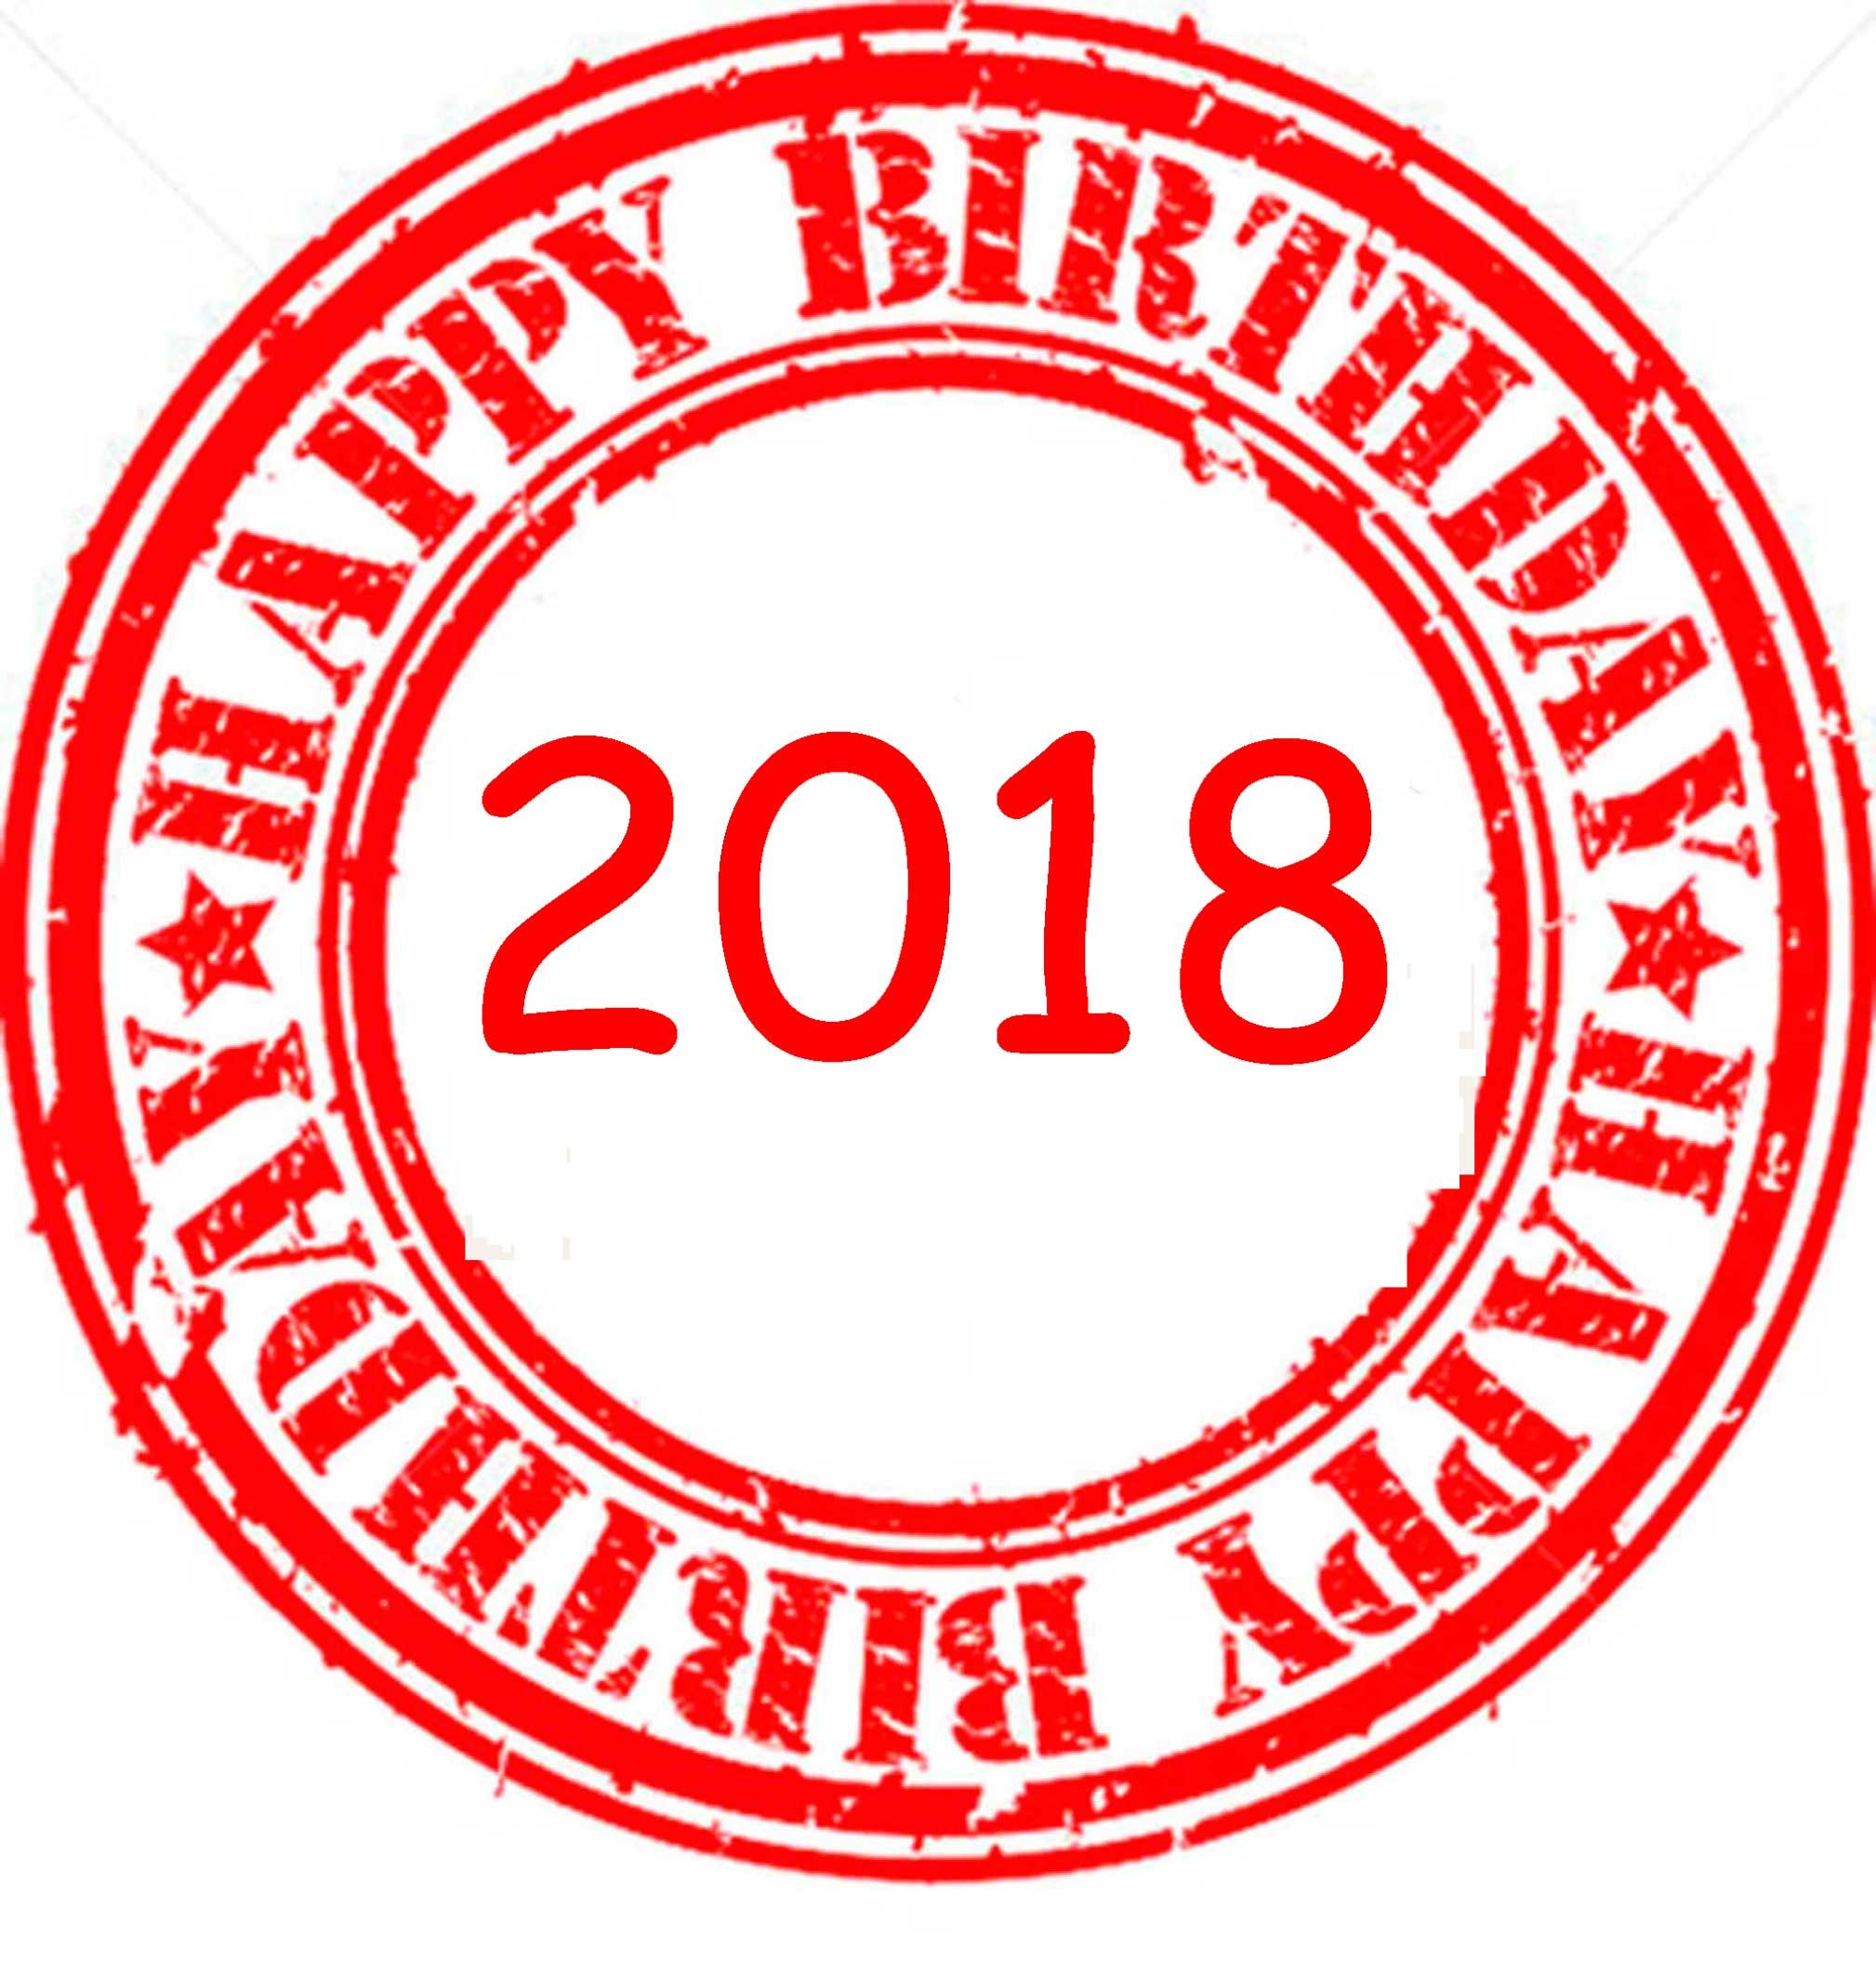 Happy Birthday 2018